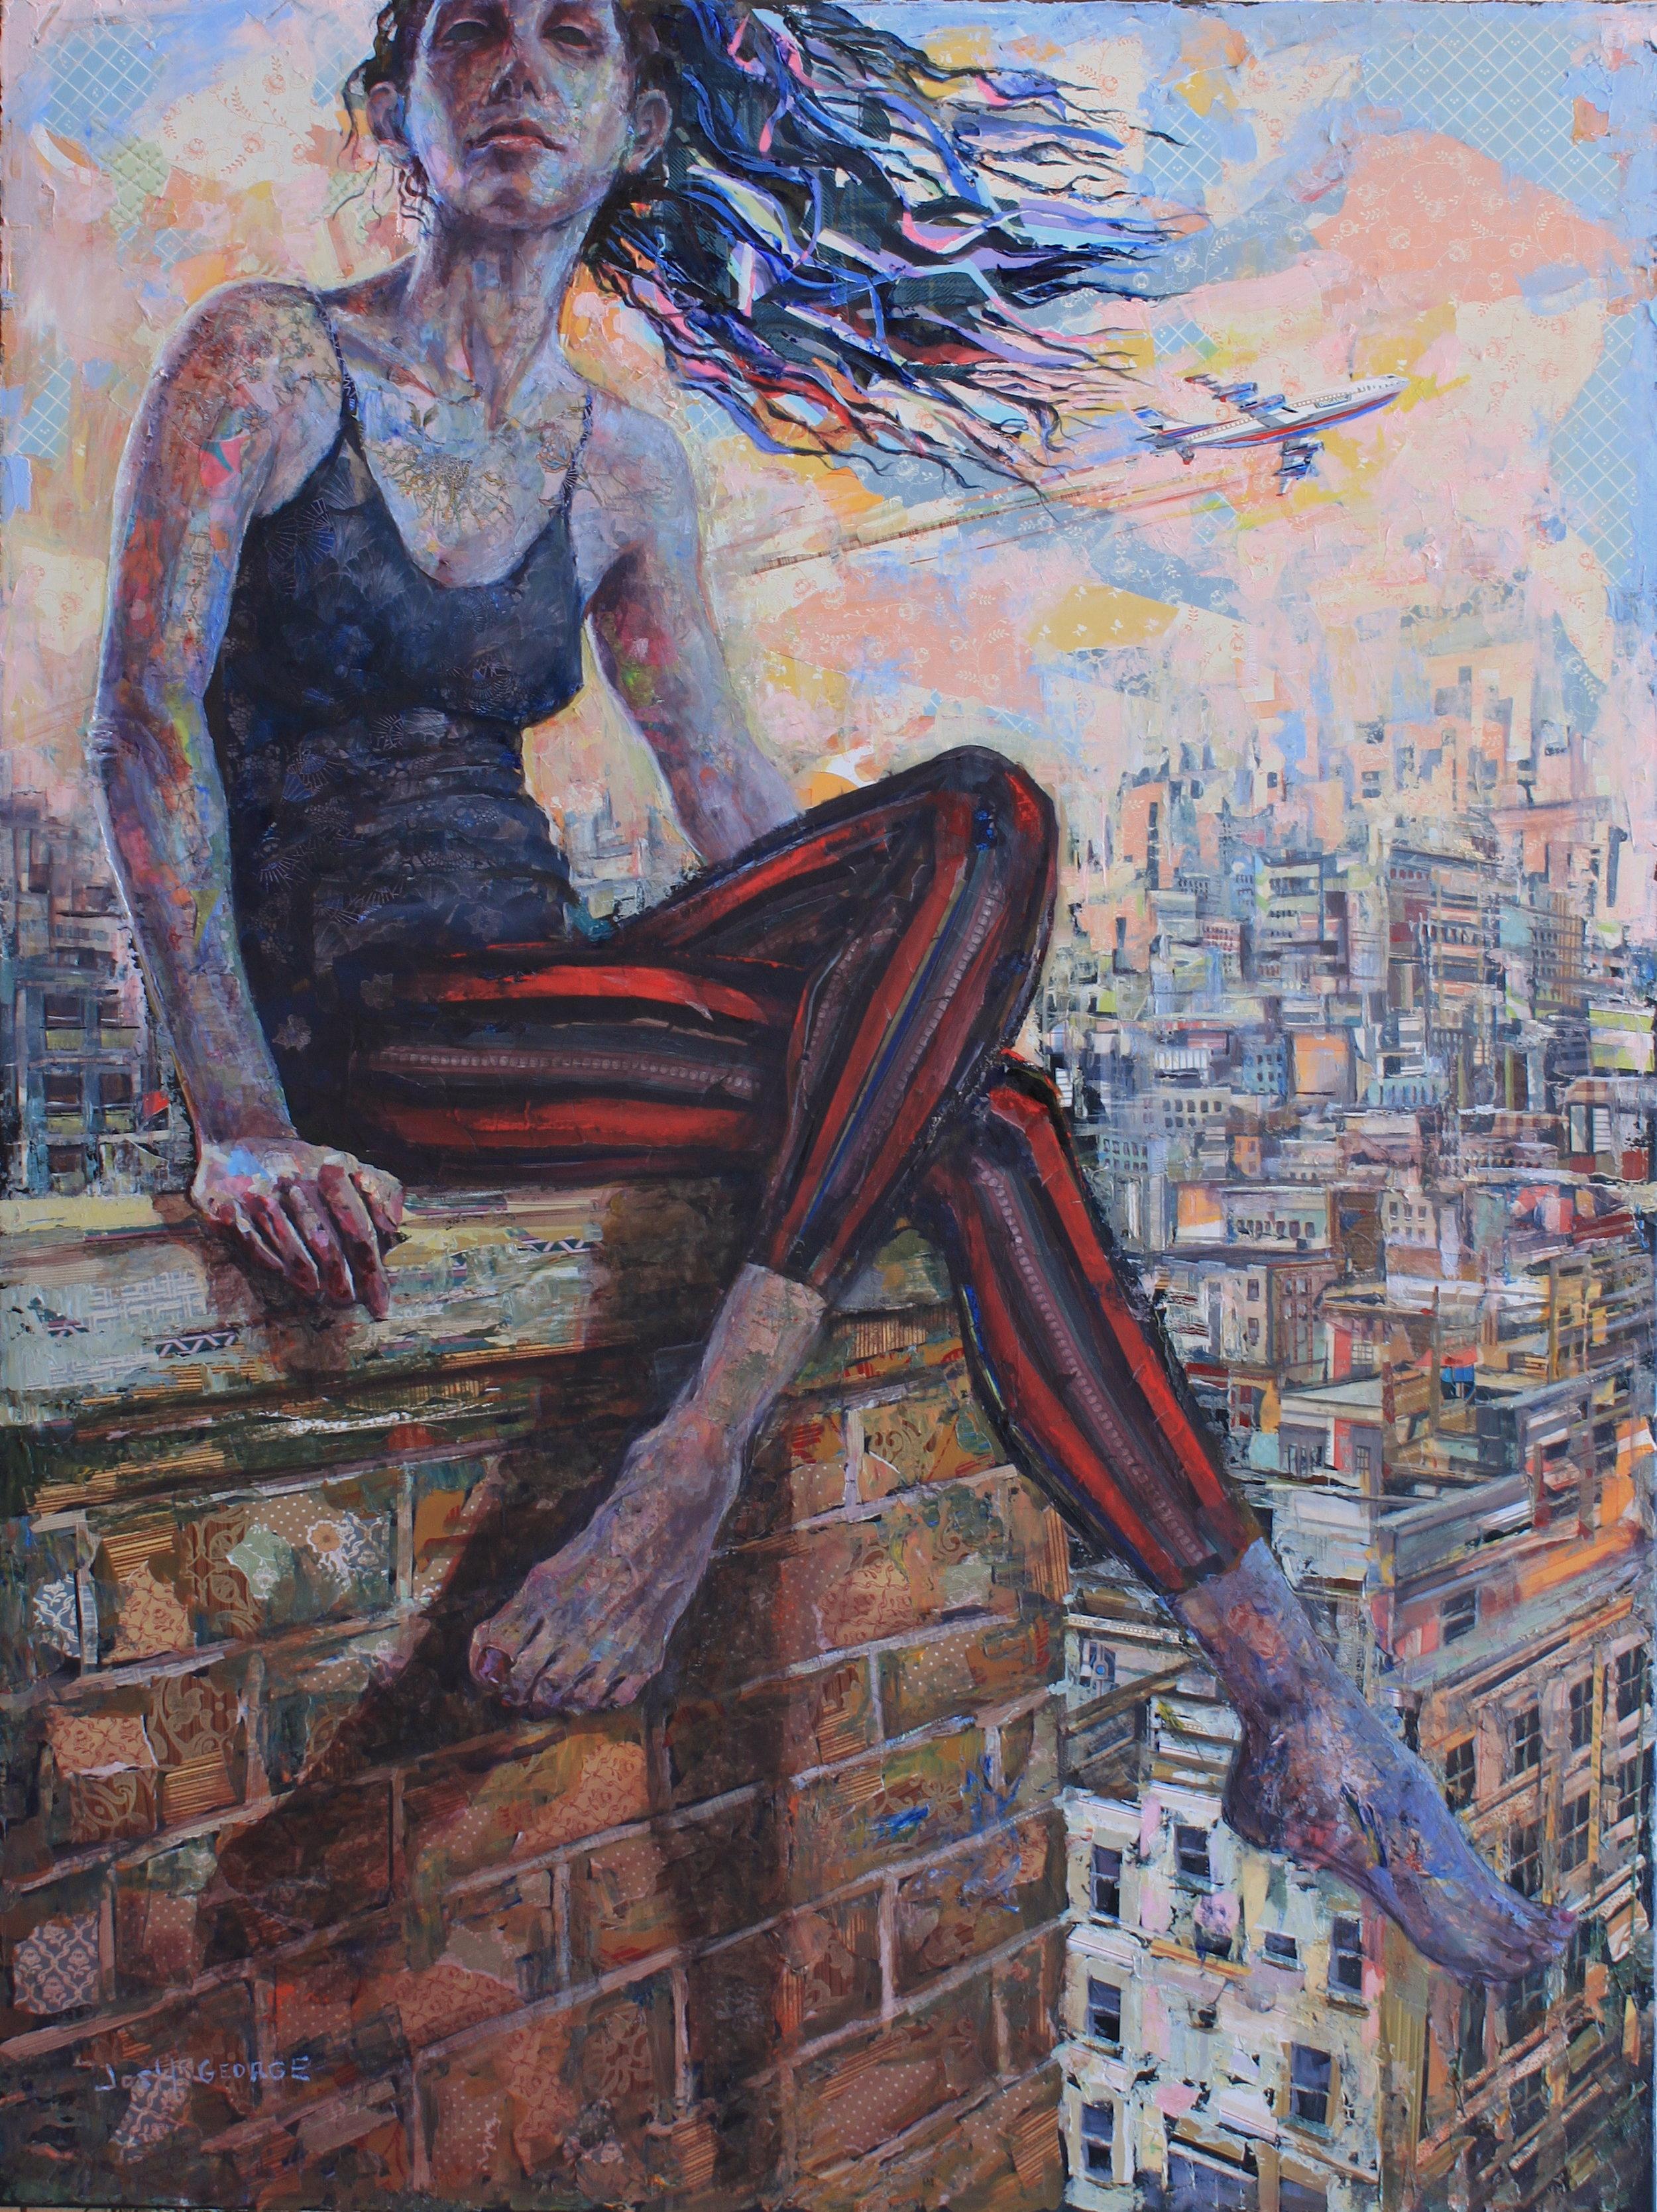 JOSH GEORGE %22To The Rainbows We Go%22 48%22 x 36%22 mixed media on canvas $5400.JPG